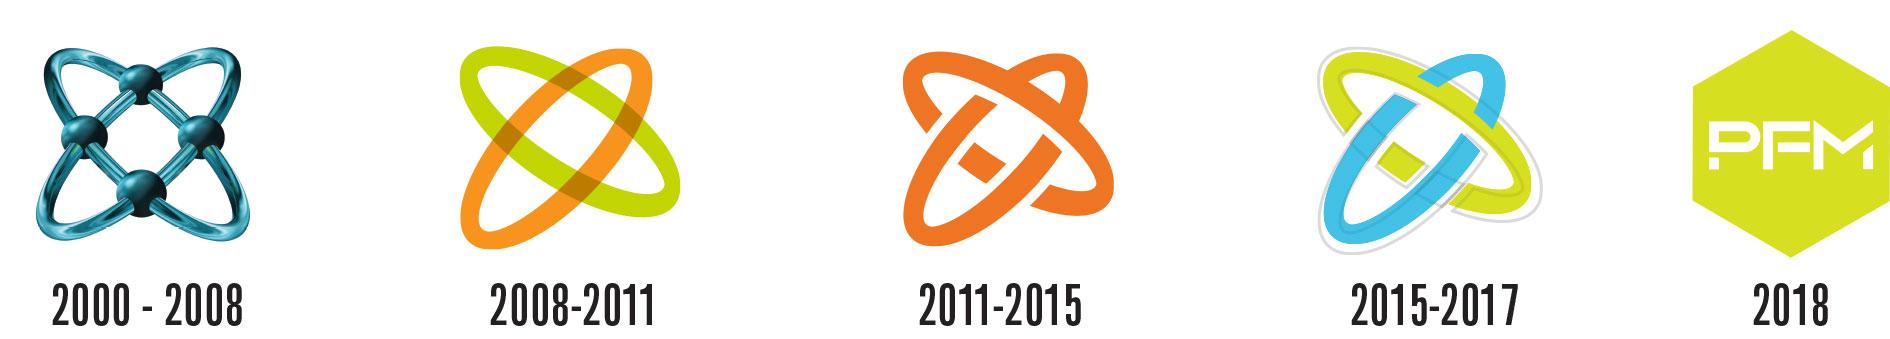 logos-throughyears.jpg